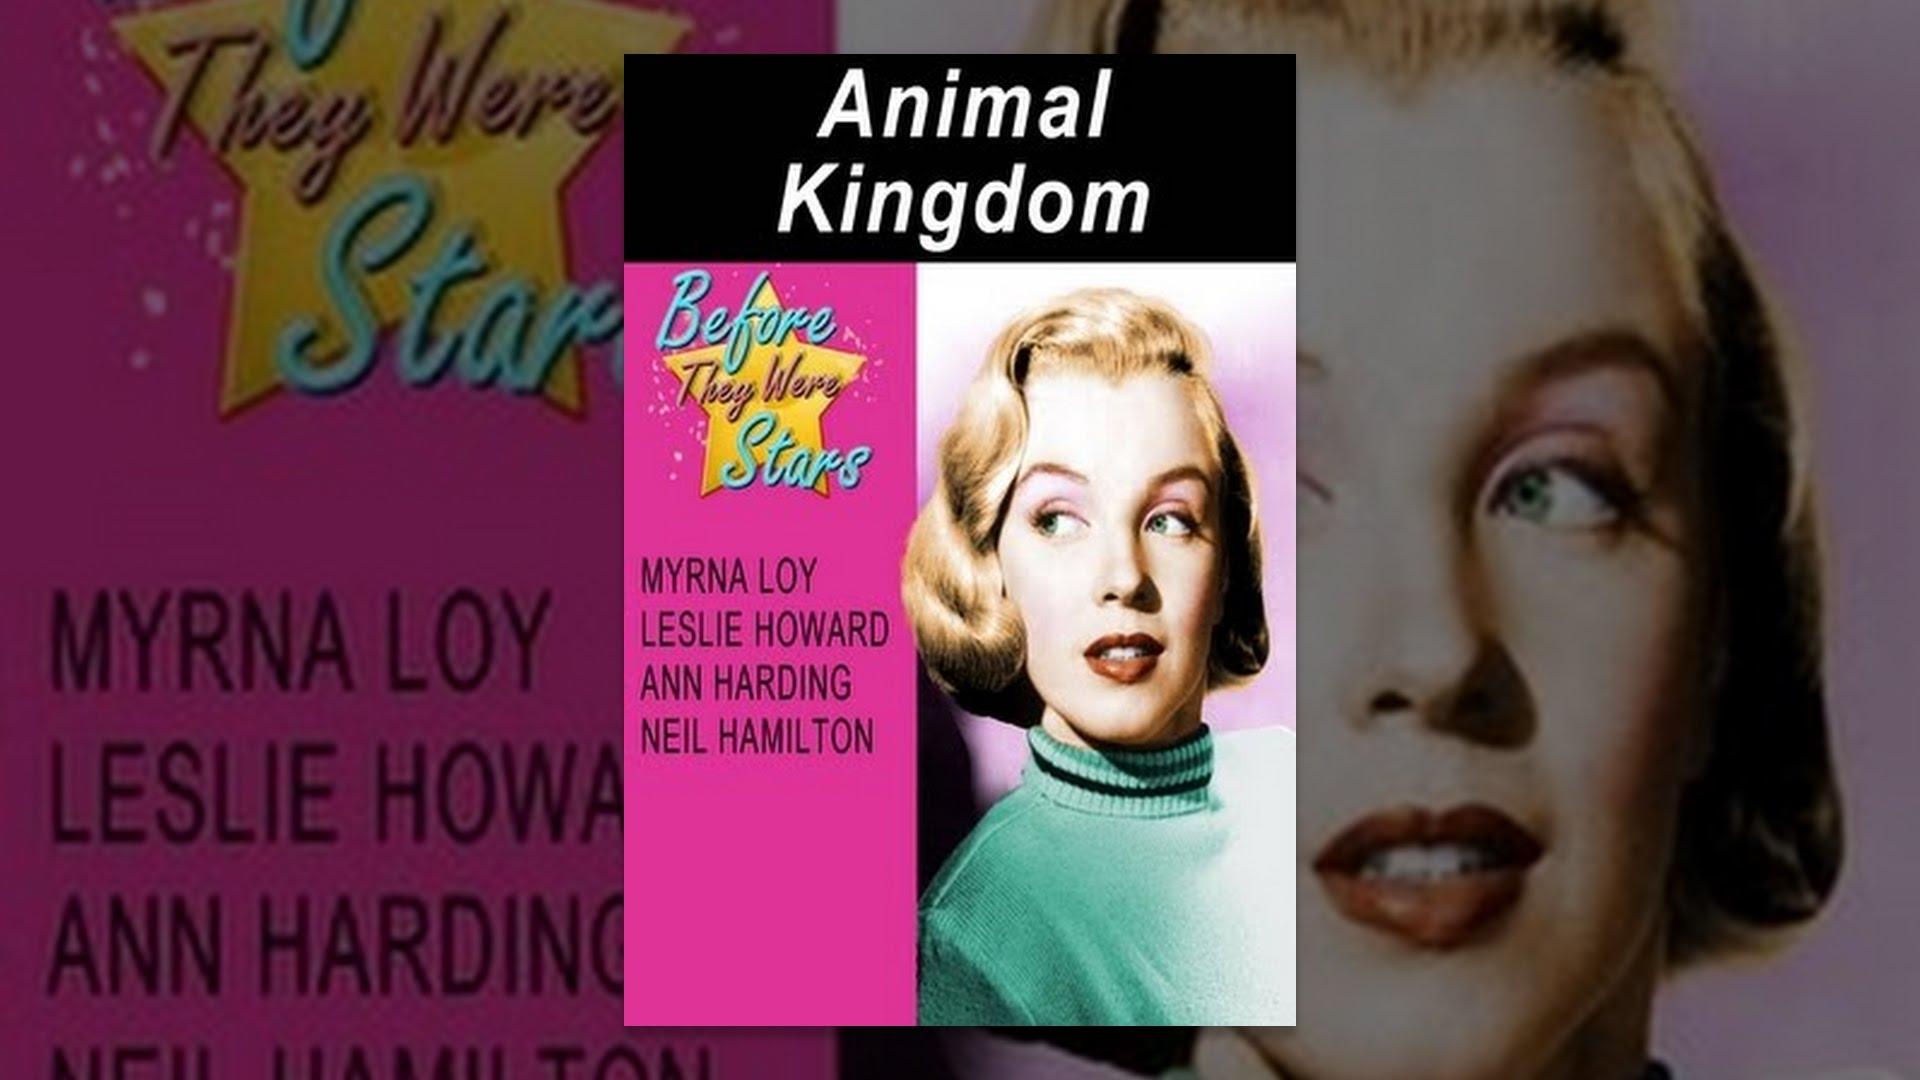 Before They Were Stars - Animal Kingdom